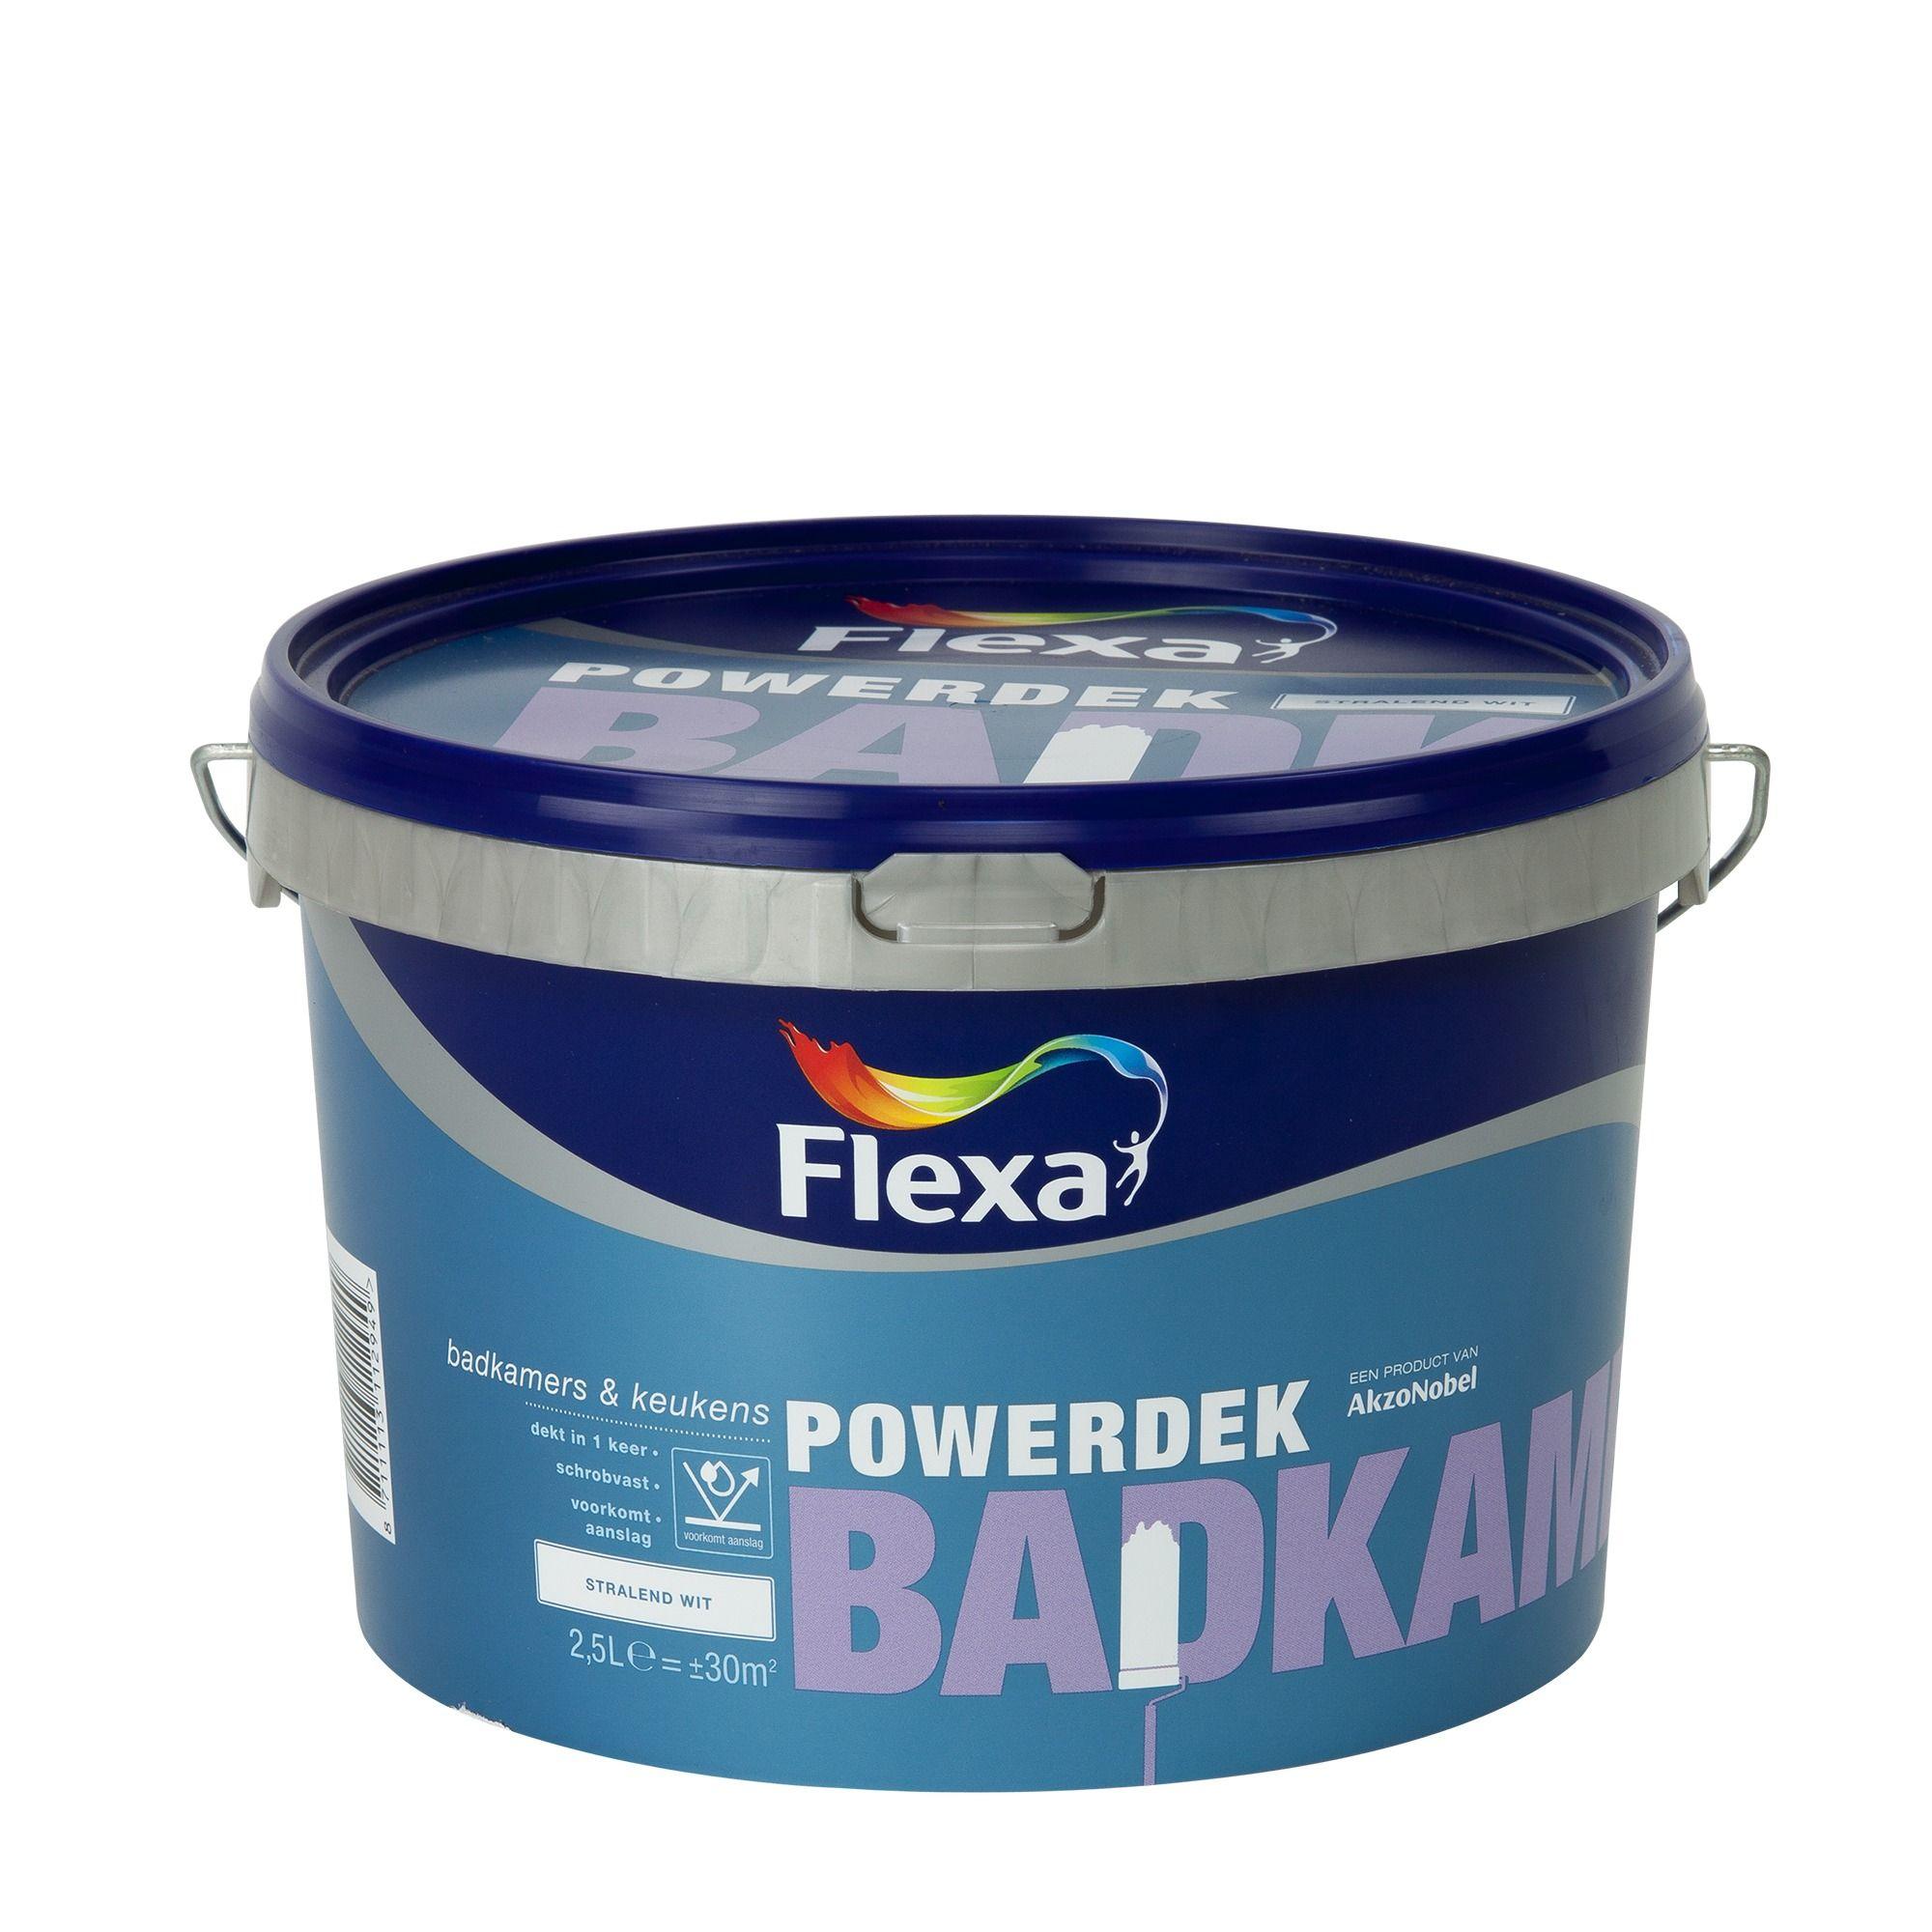 Flexa Powerdek latex Badkamer & Keuken stralend wit mat 2,5 liter ...